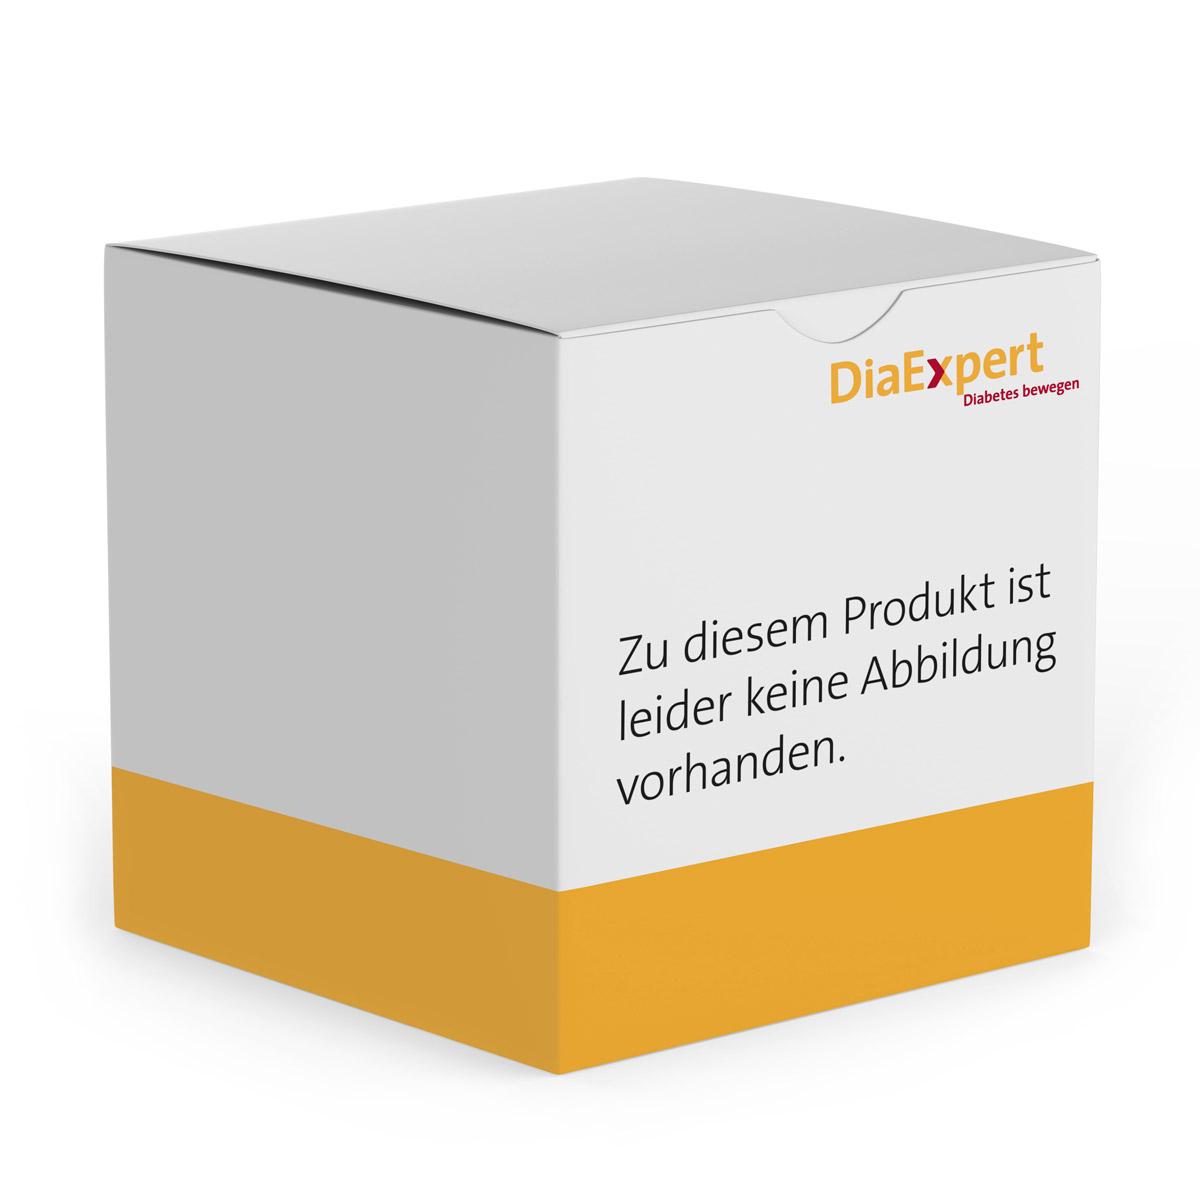 Accu-Chek Aviva Expert Set mmol/L